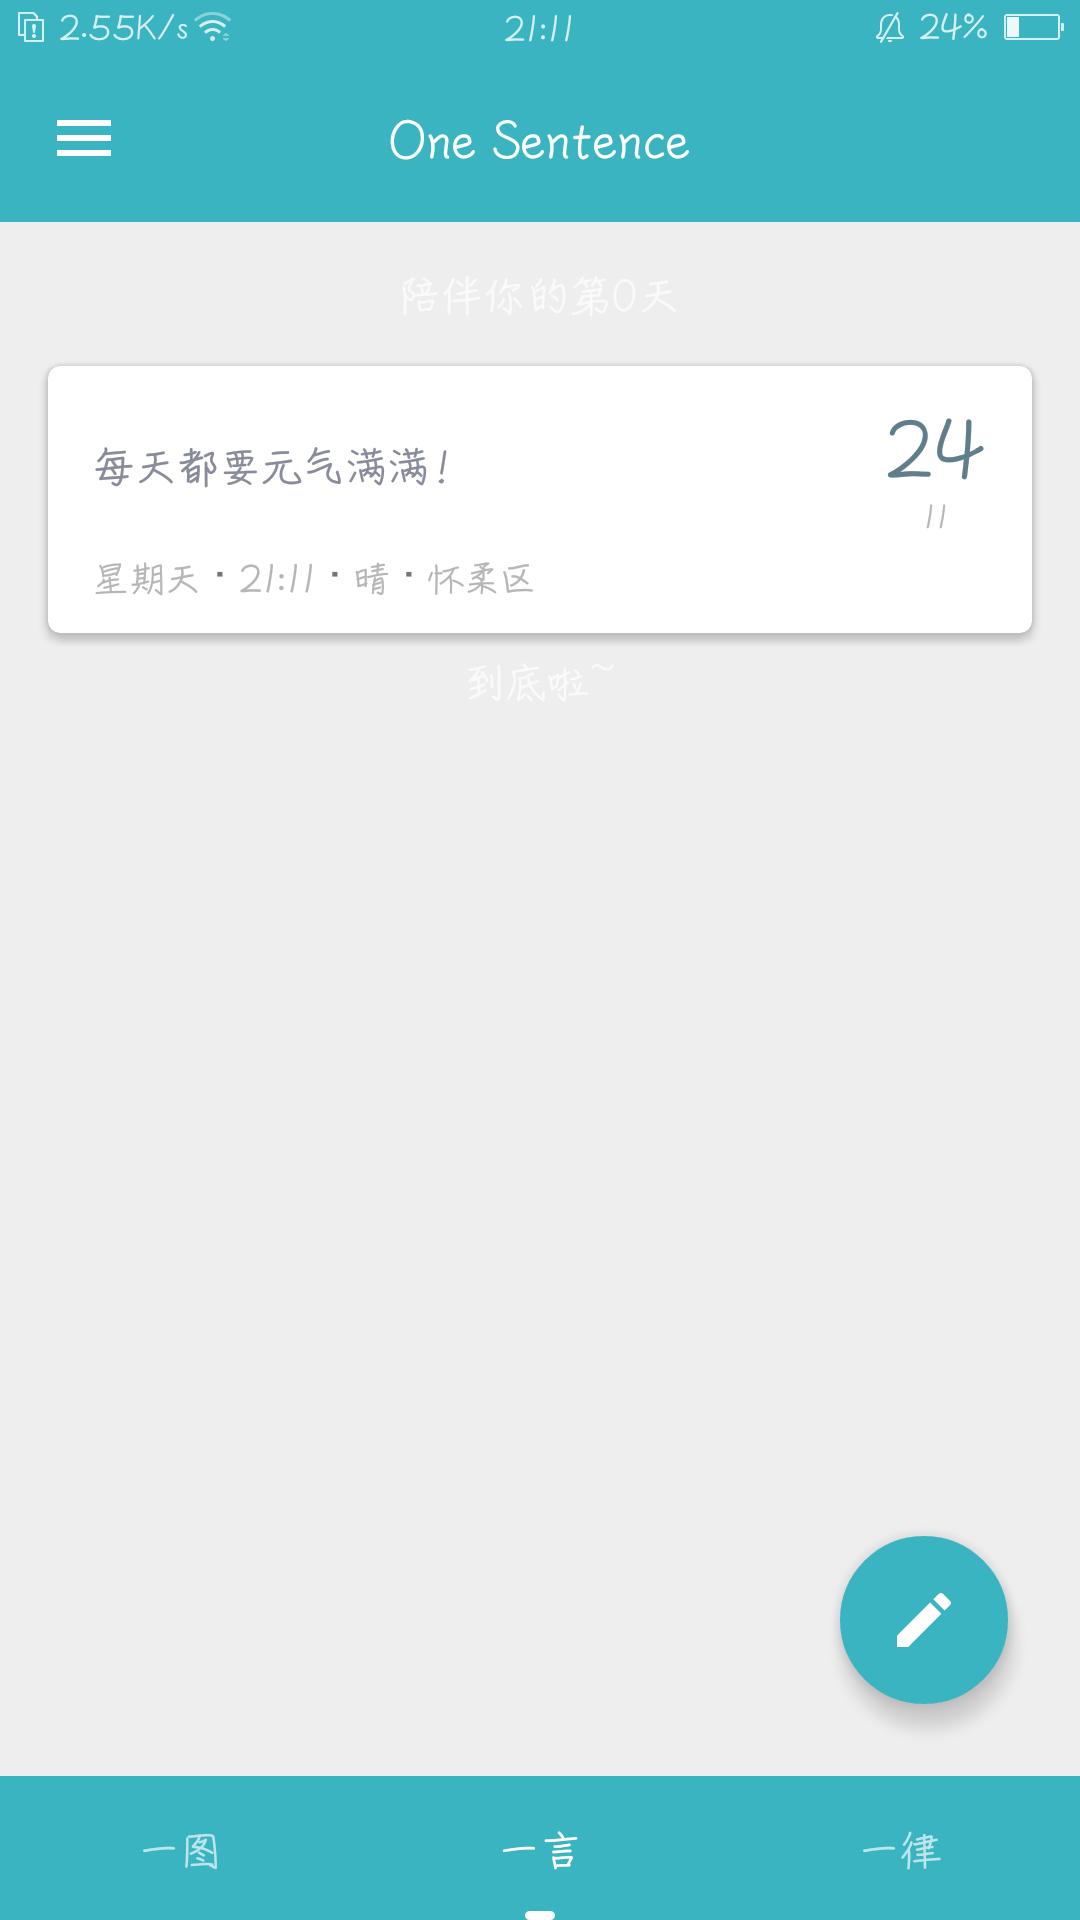 【分享】justDo - 日常vs习惯 1.198